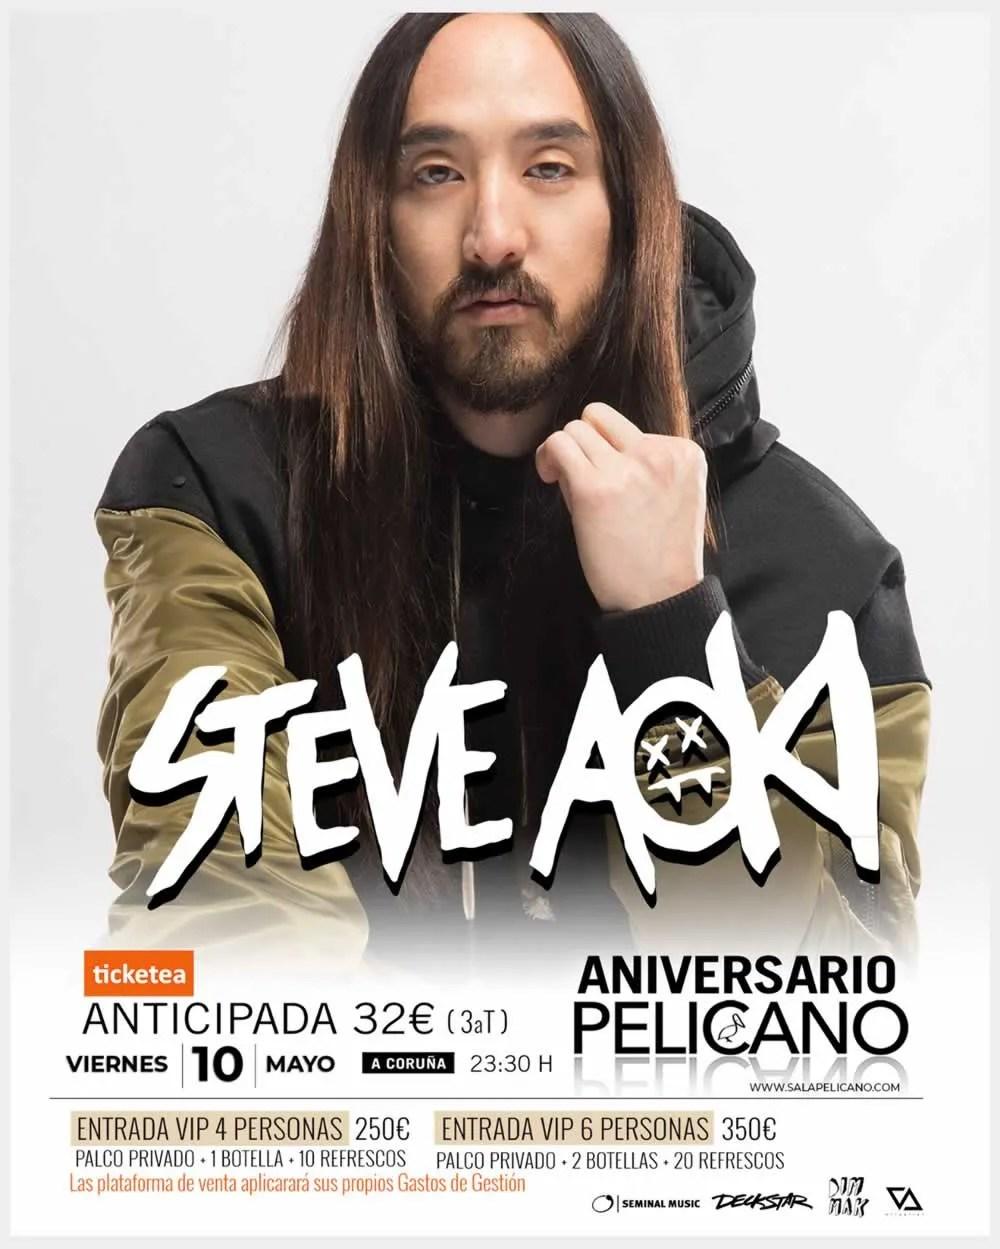 Steve Aoki Pelicano